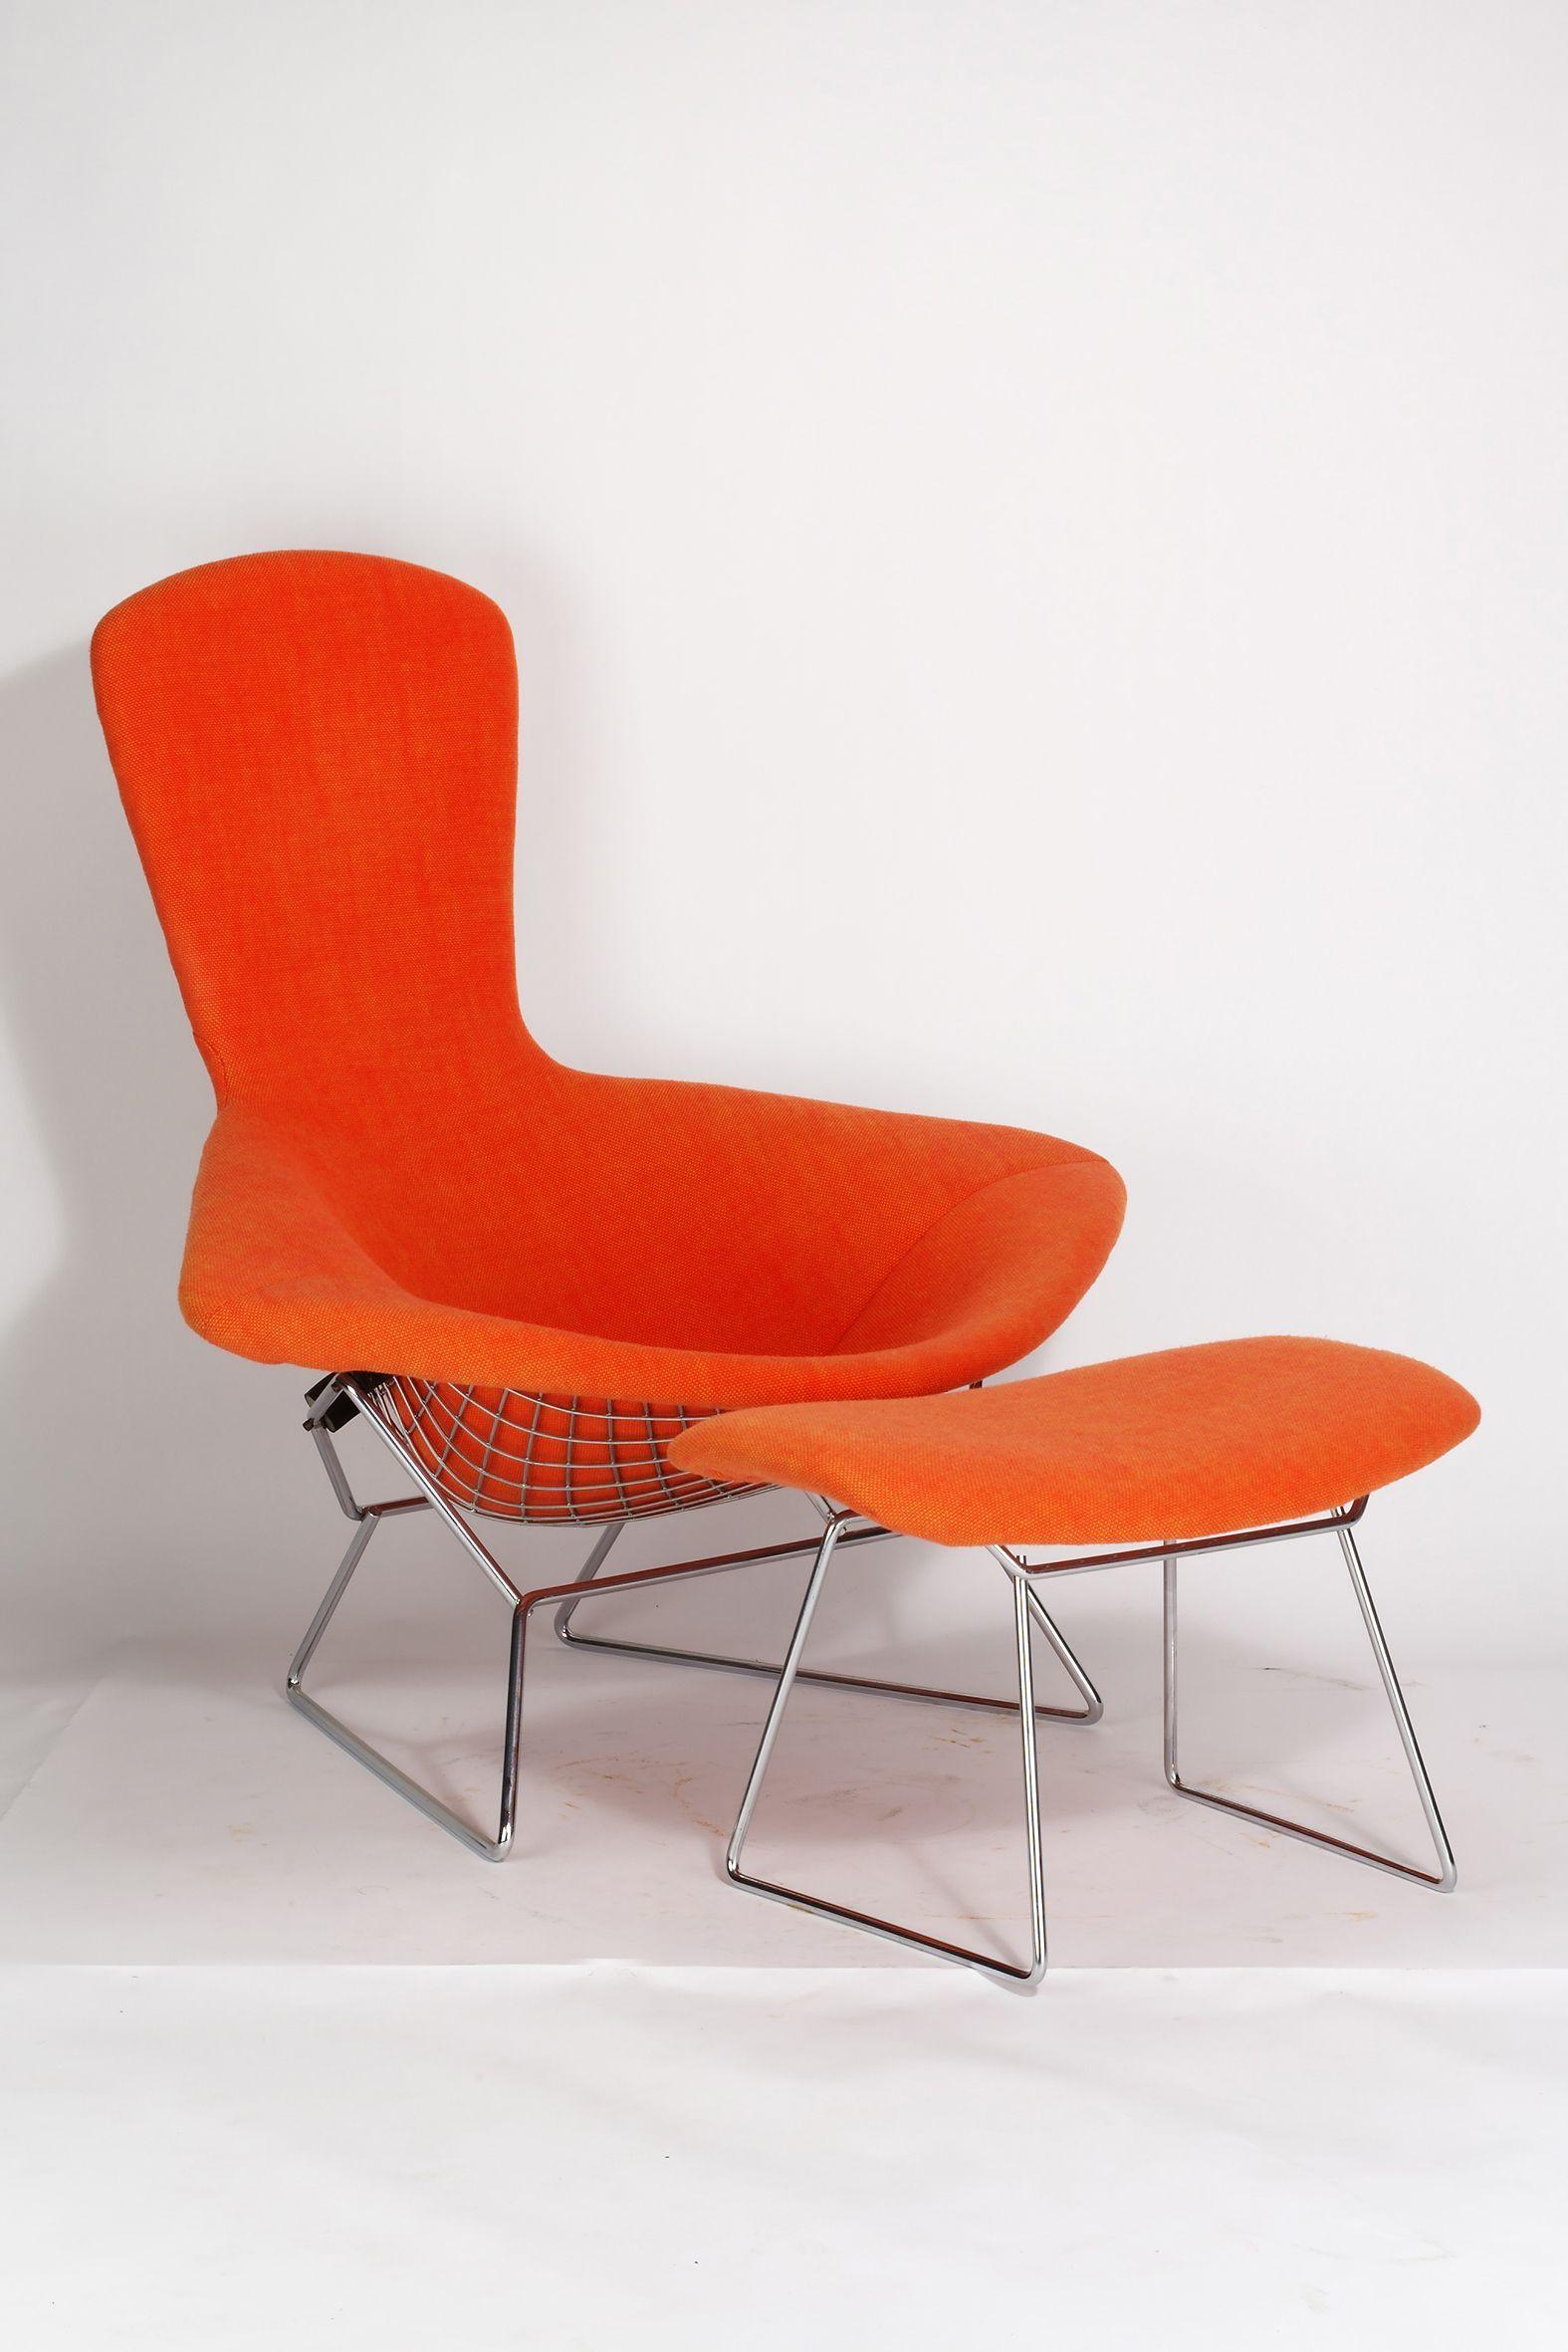 Harry Bertoia, Bird Chair Modell No. 423 Lu (1950 1952)